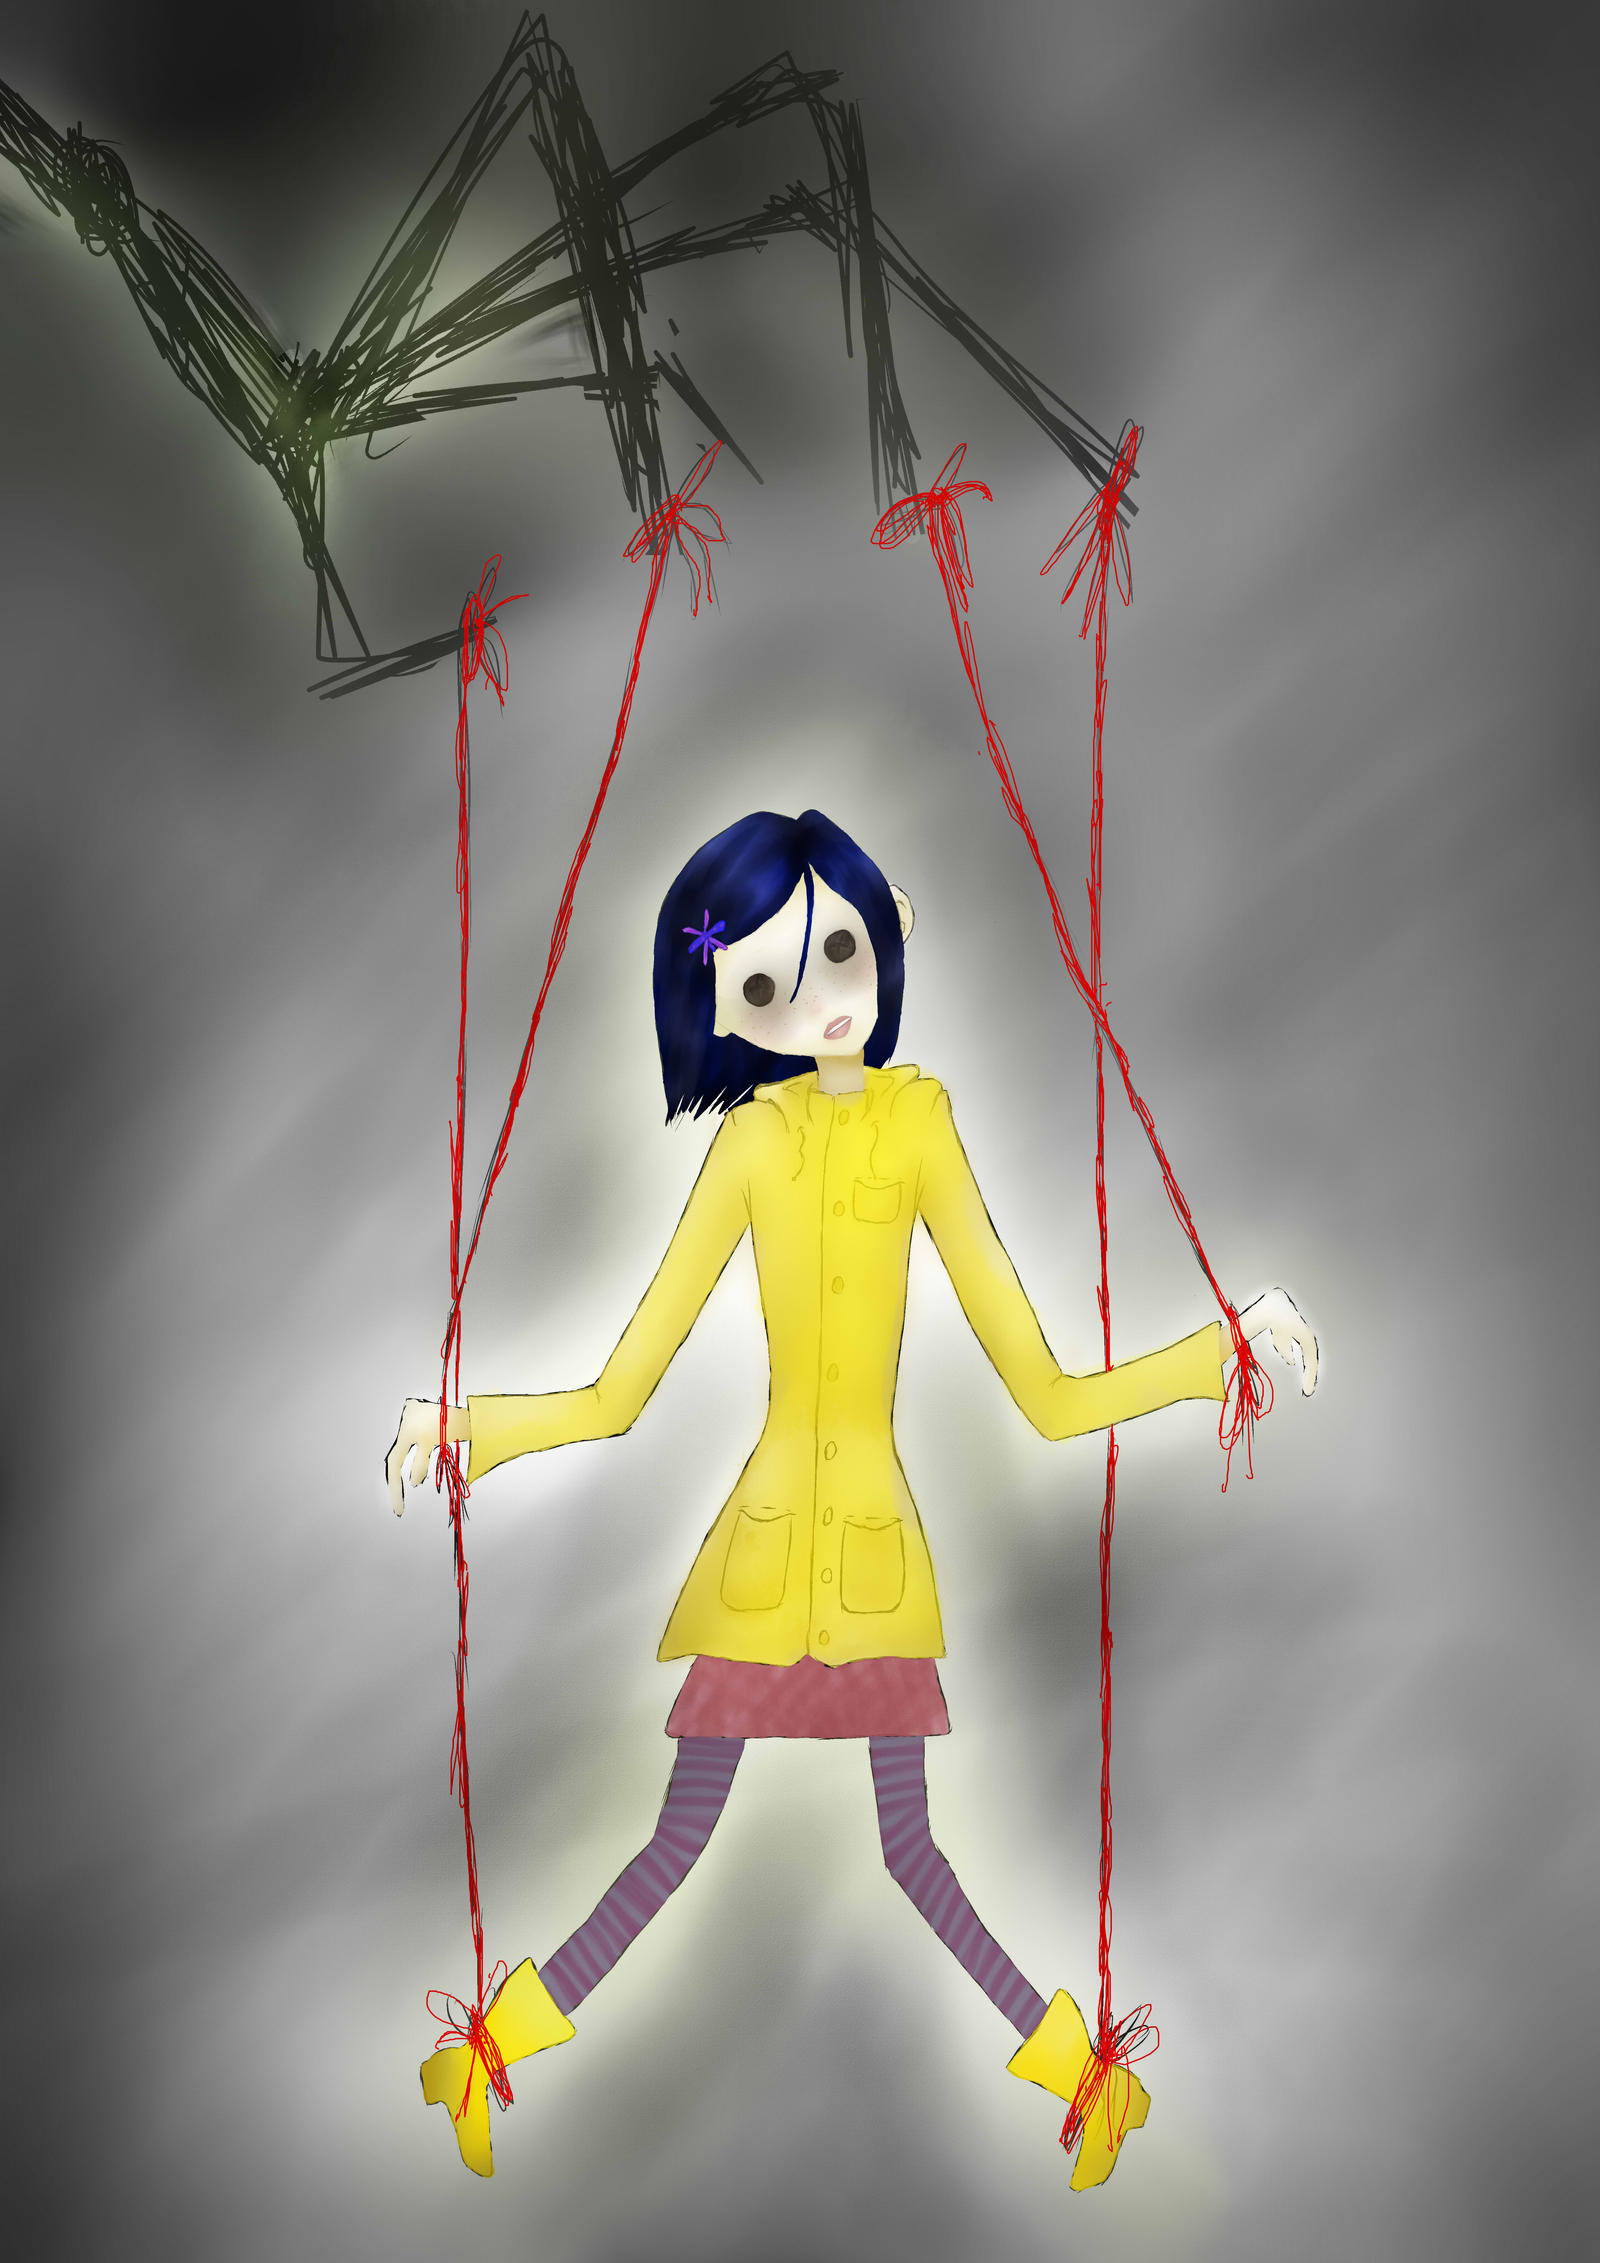 String Puppet Art | www.imgkid.com - The Image Kid Has It!